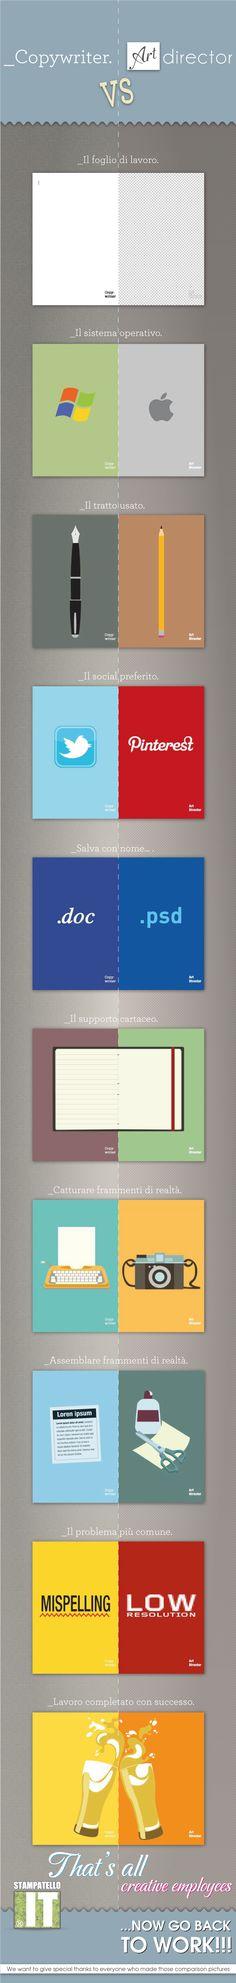 Copywriter VS Art Director - #infographic